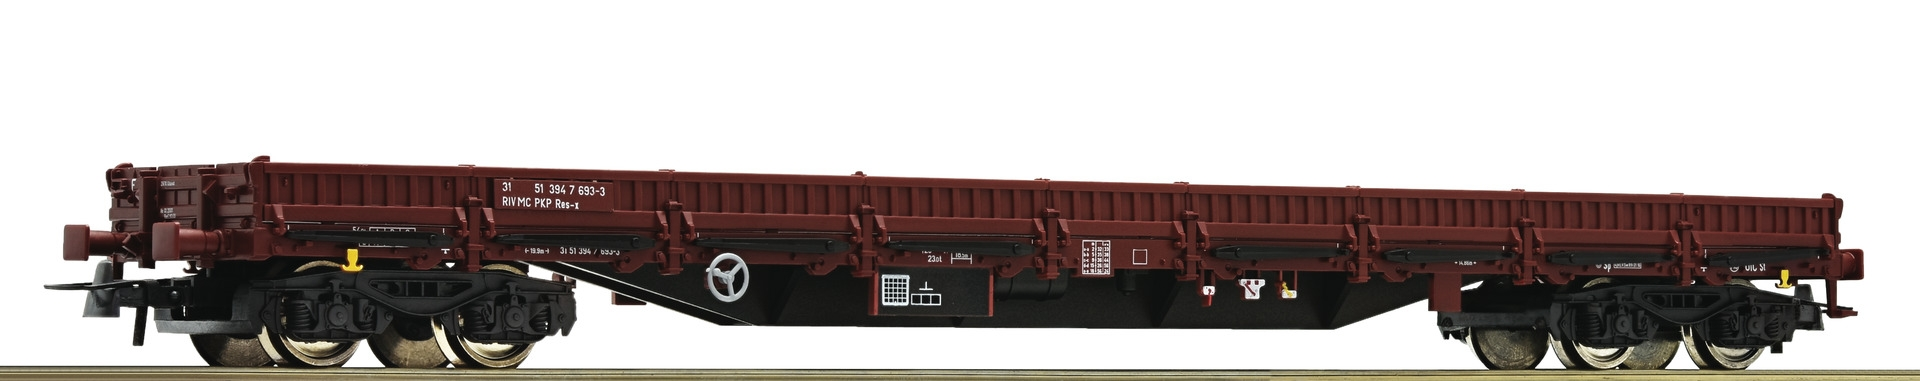 76981 - Roco Stanchion wagon, PKP, HO